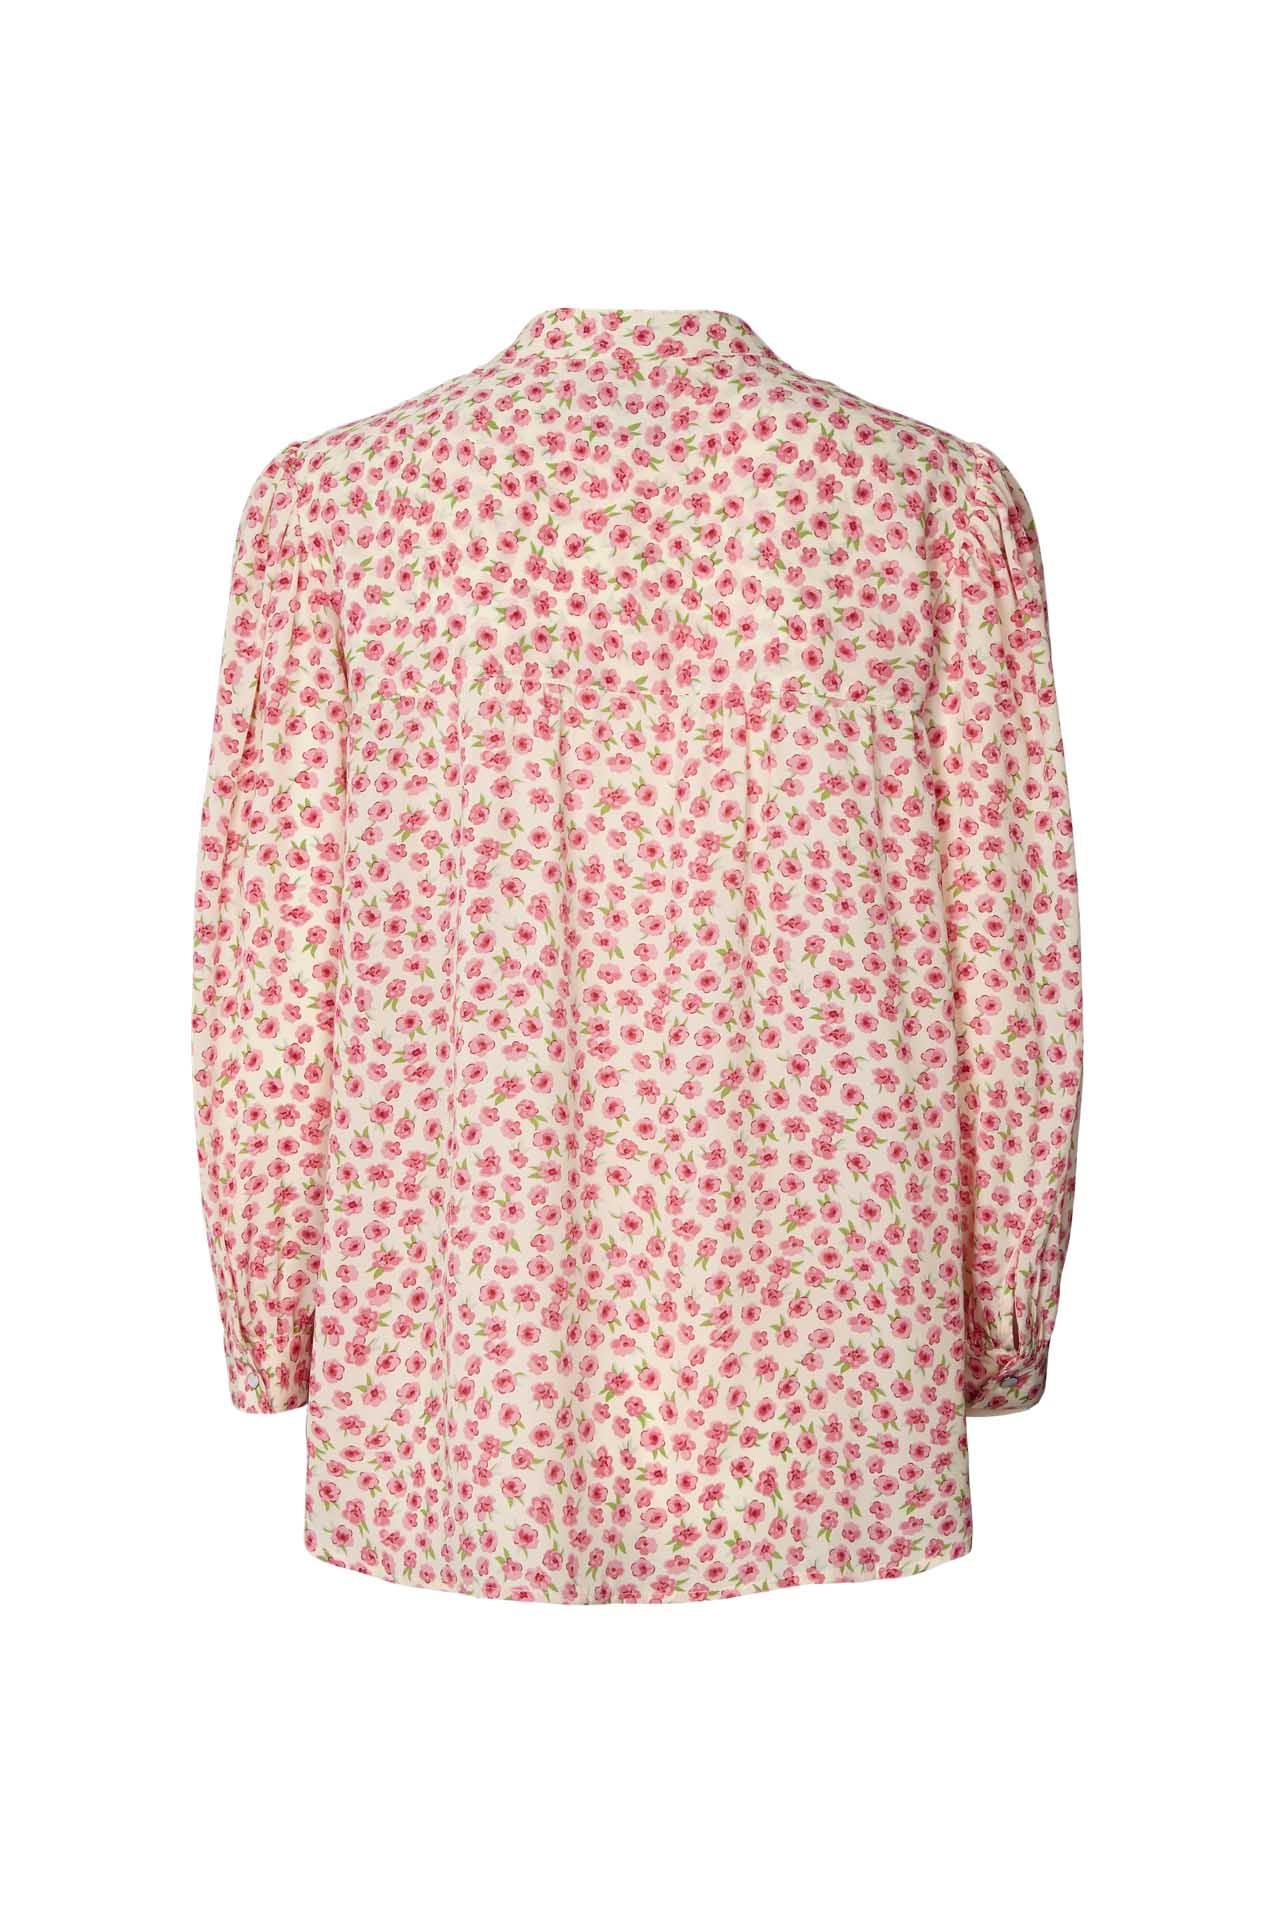 Lollys Laundry Frankie skjorte, creme, large